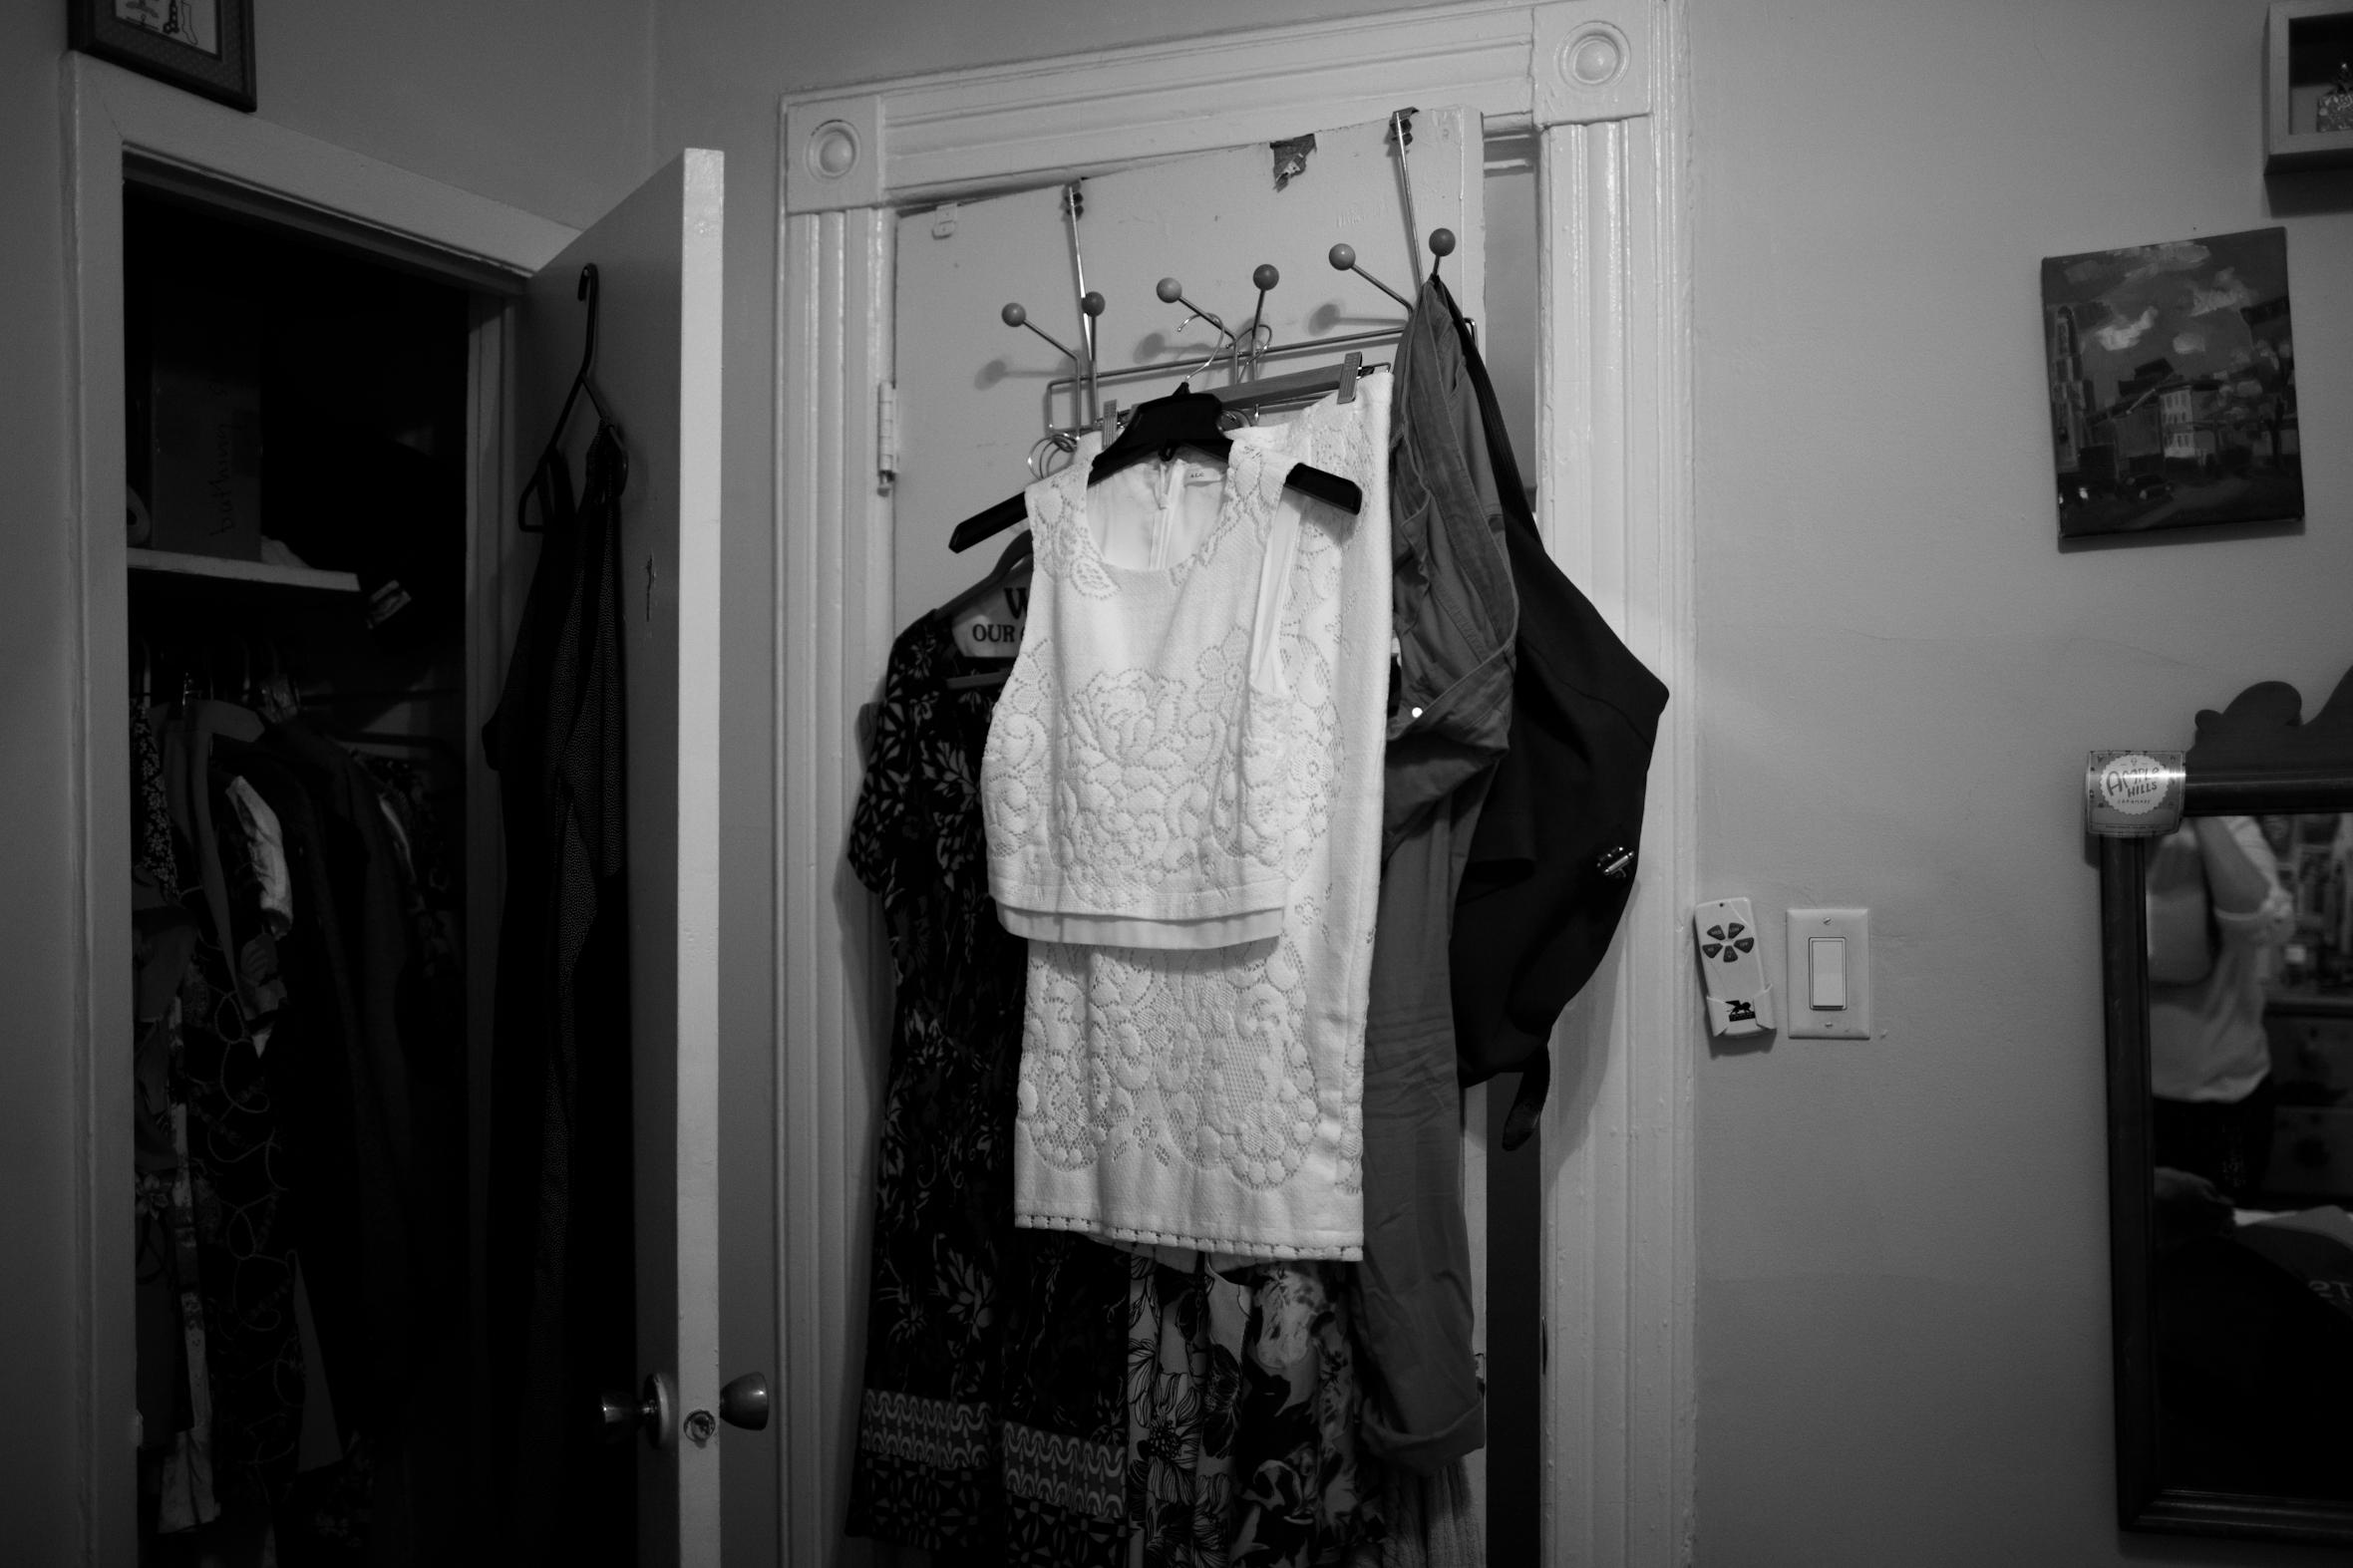 two piece white wedding dress hanging on door